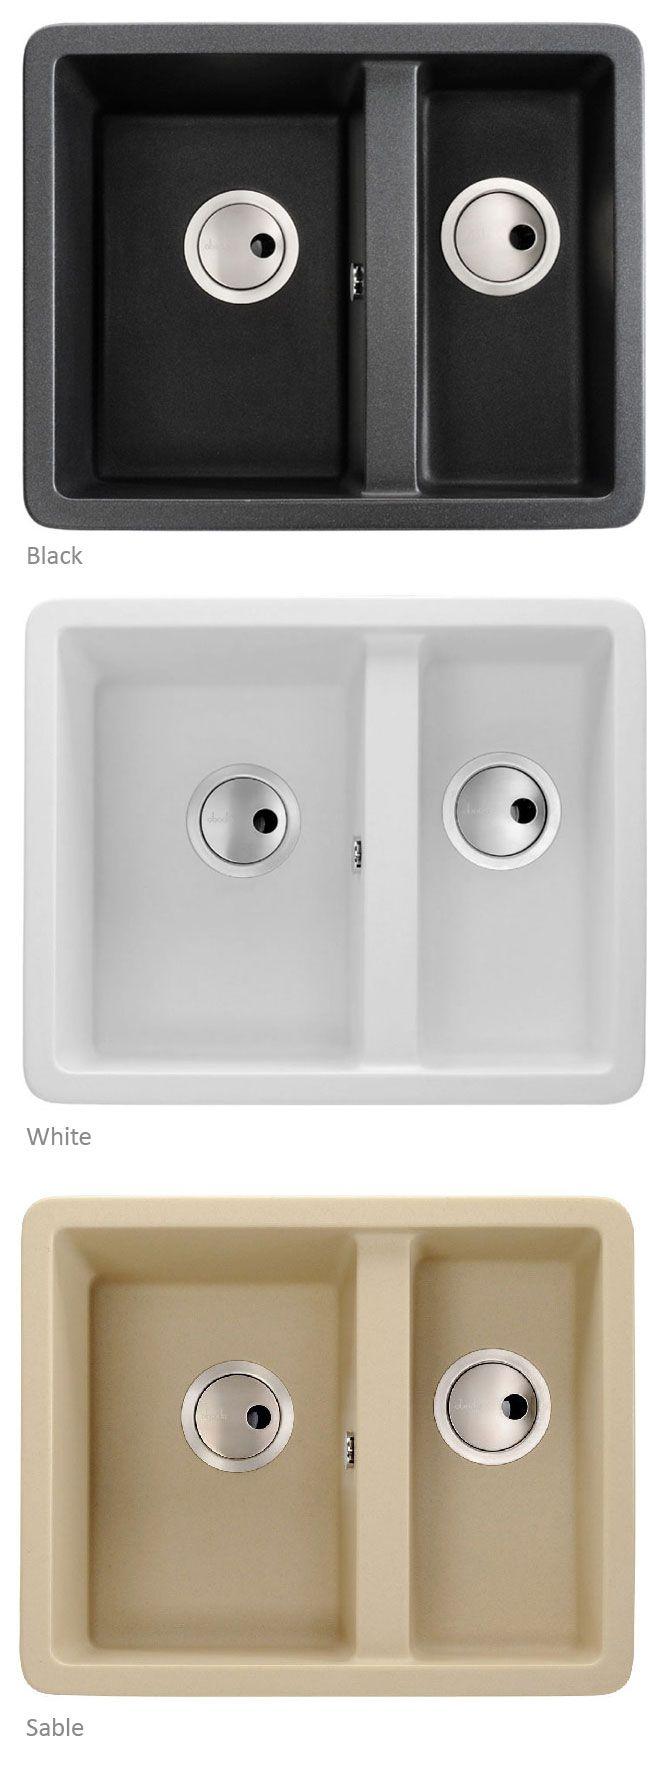 29 best abode designer sinks & taps images on pinterest | taps